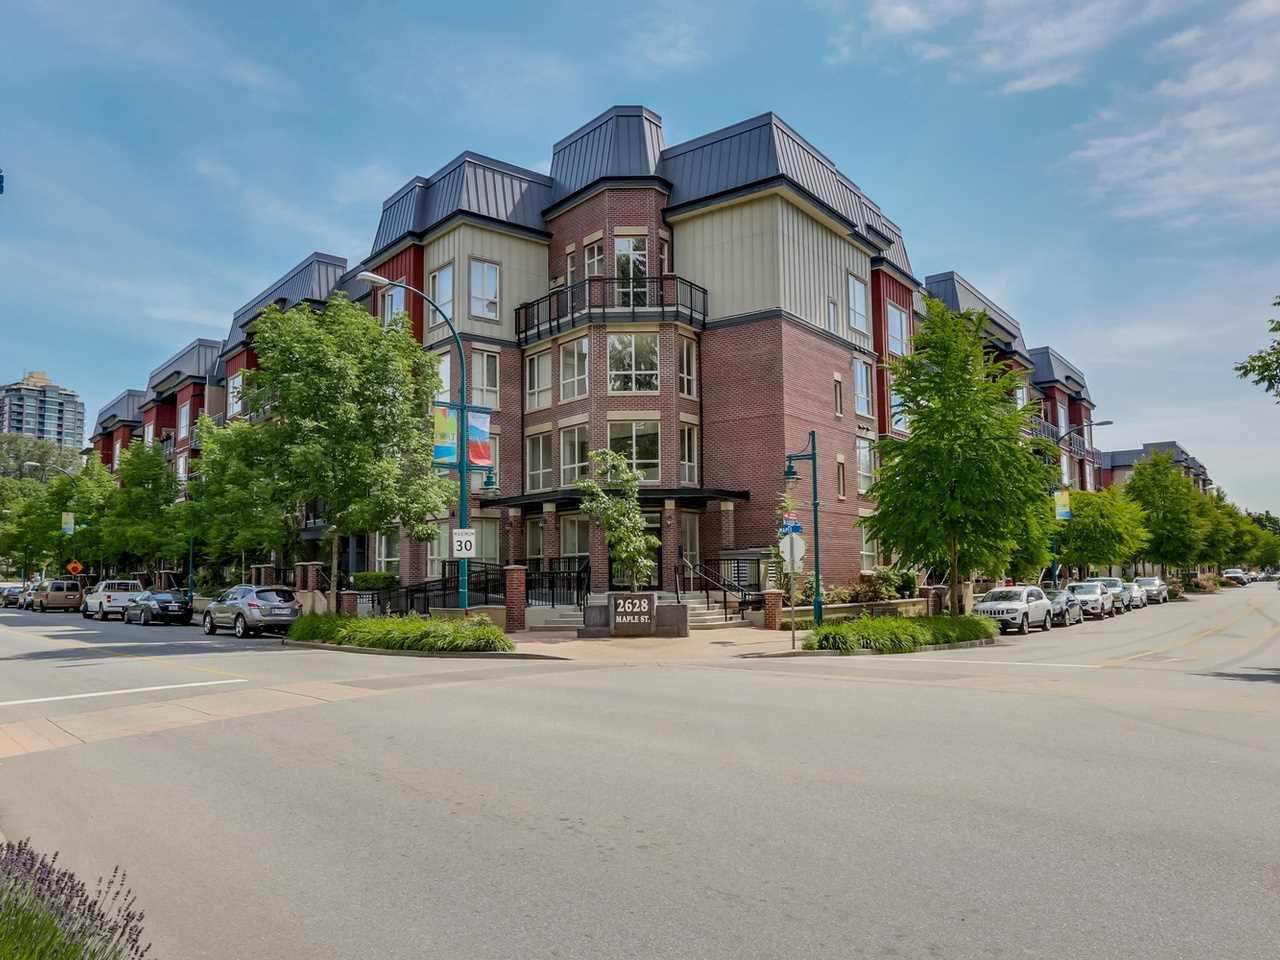 "Main Photo: 316 2628 MAPLE Street in Port Coquitlam: Central Pt Coquitlam Condo for sale in ""VILLAGIO 2"" : MLS®# R2074698"